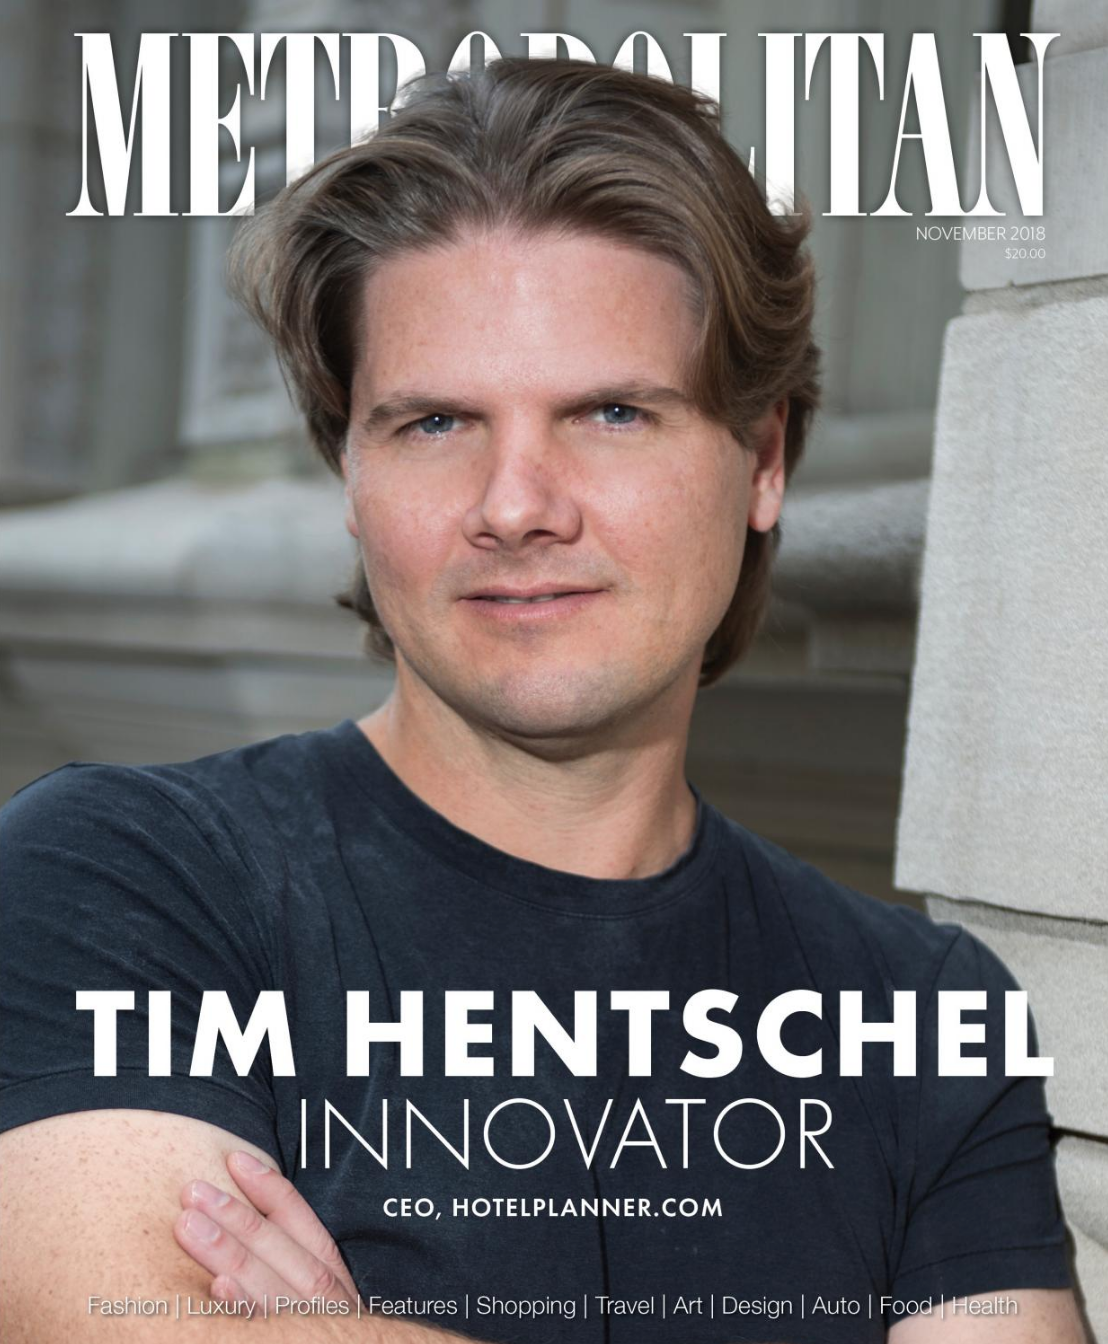 Metropolitan Magazine - November 2018 ft. Tim Hentschel by photographer Andrew Werner.png